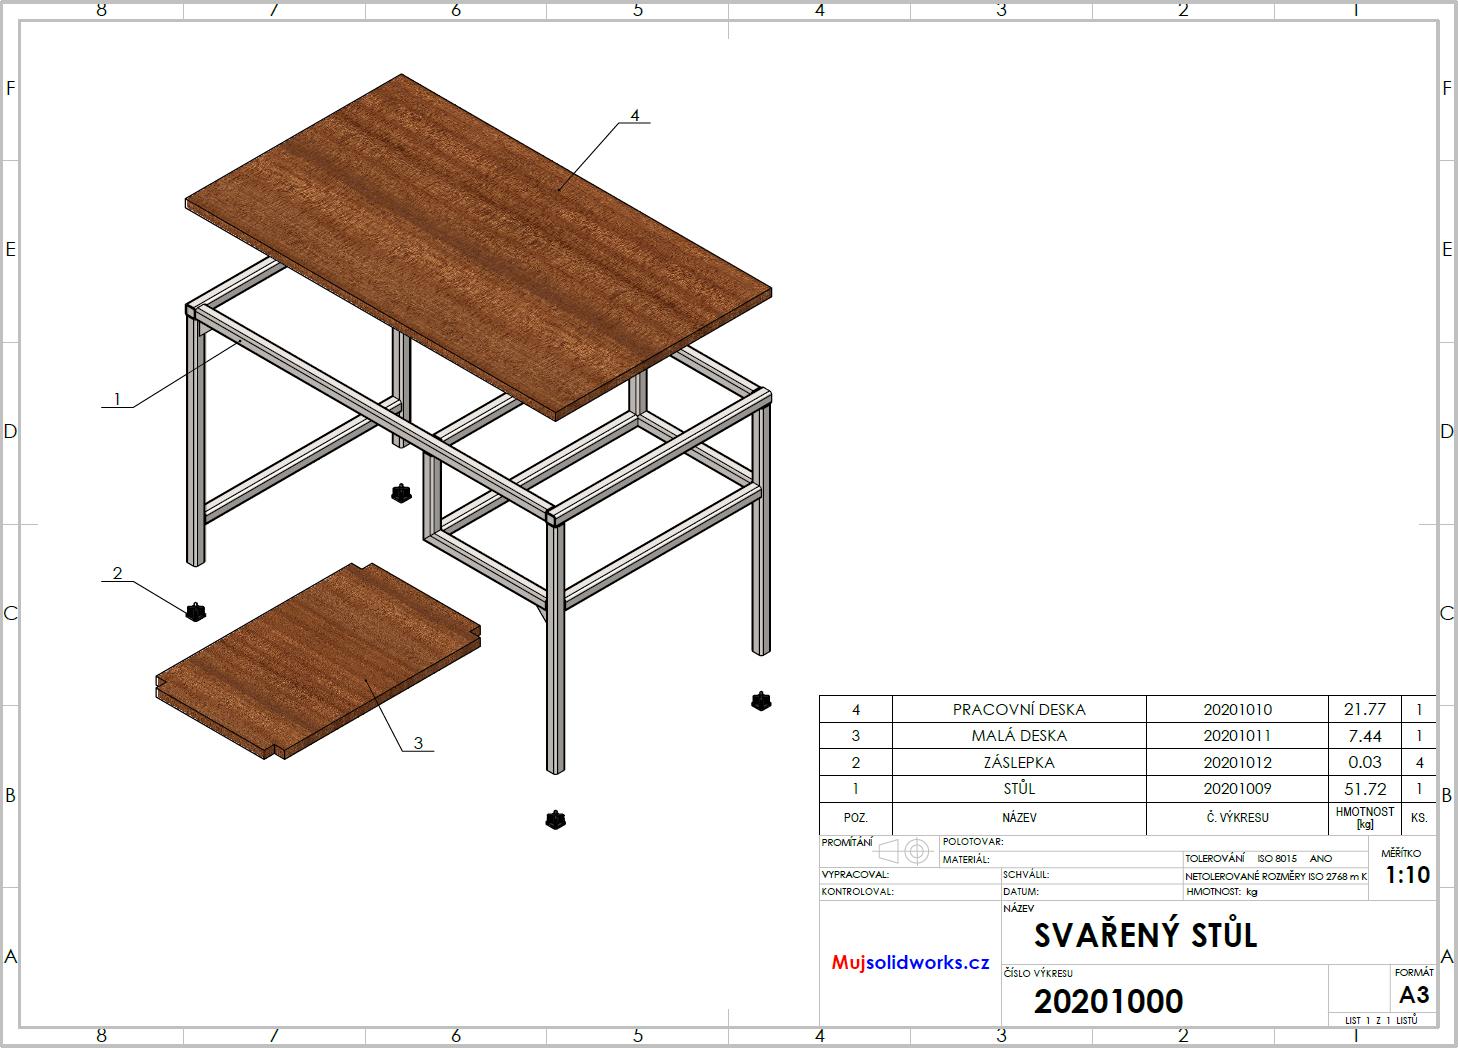 300-welding-svarovani-SolidWorks-postup-tutorial-navod-zaciname-ucime-se